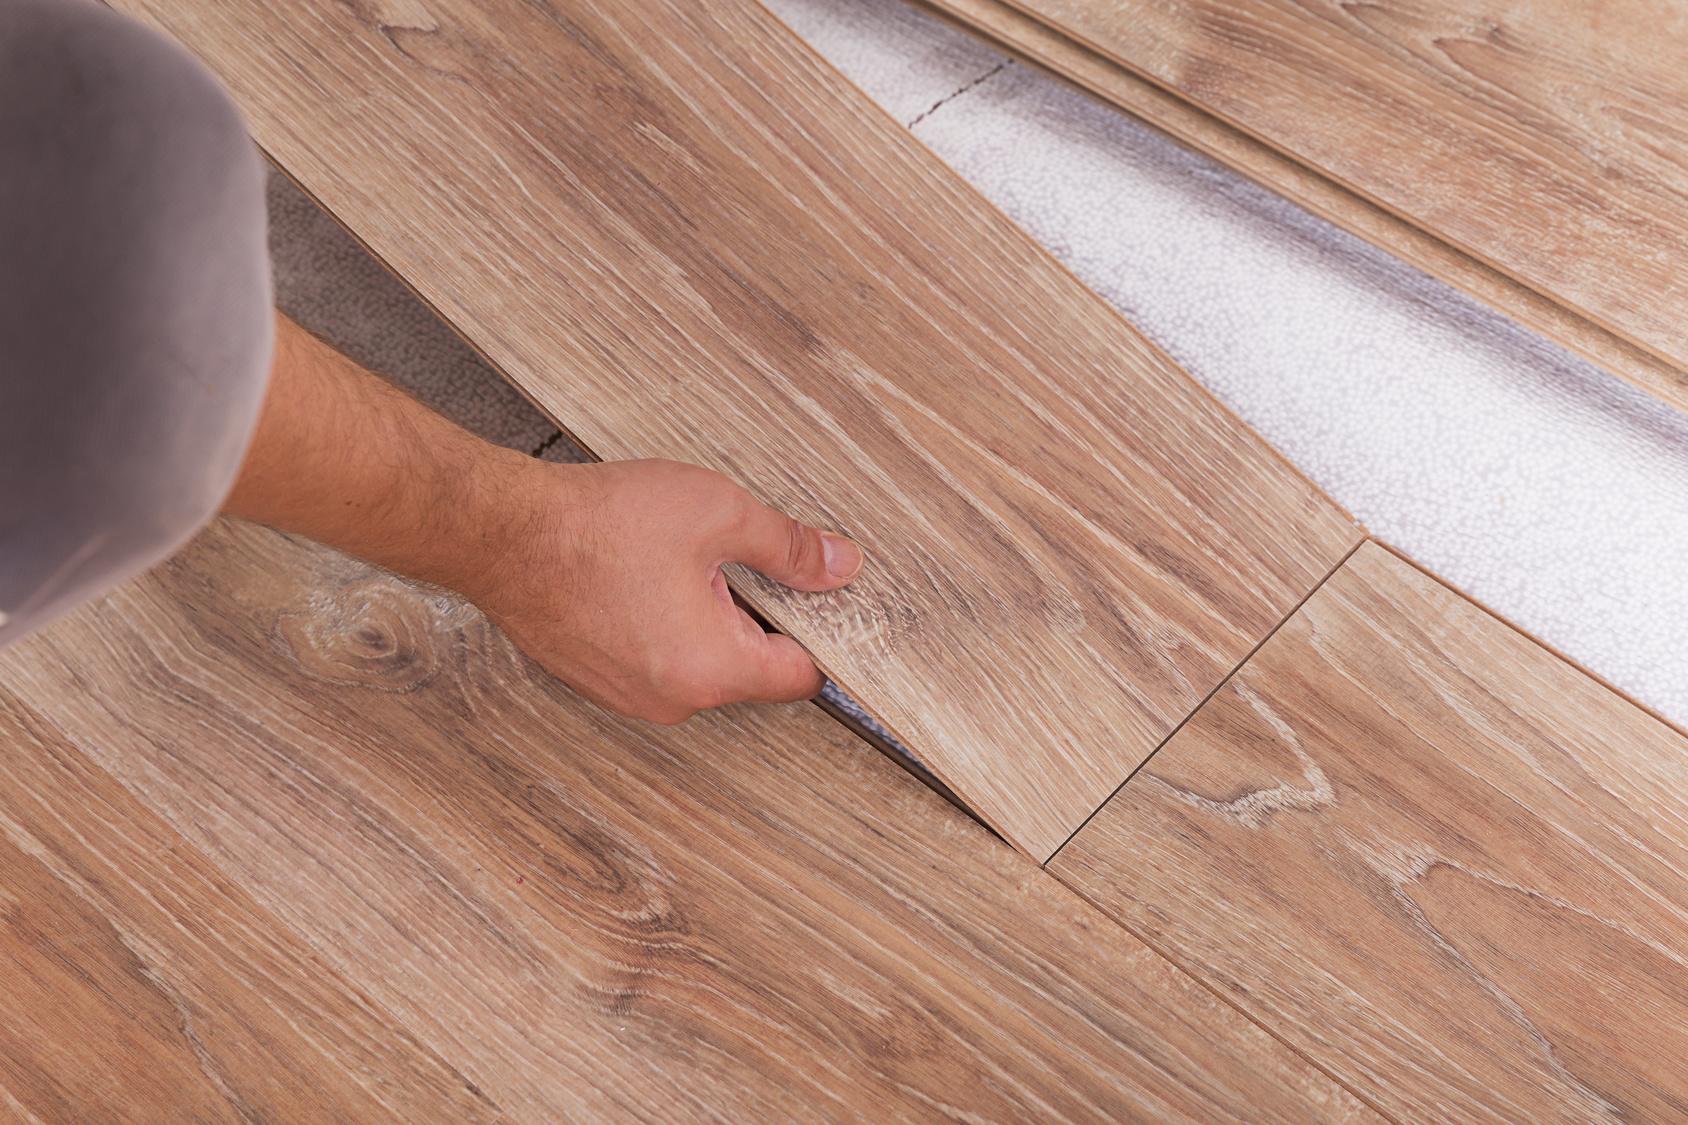 Tongue and groove hardwood flooring installation in Keller, TX